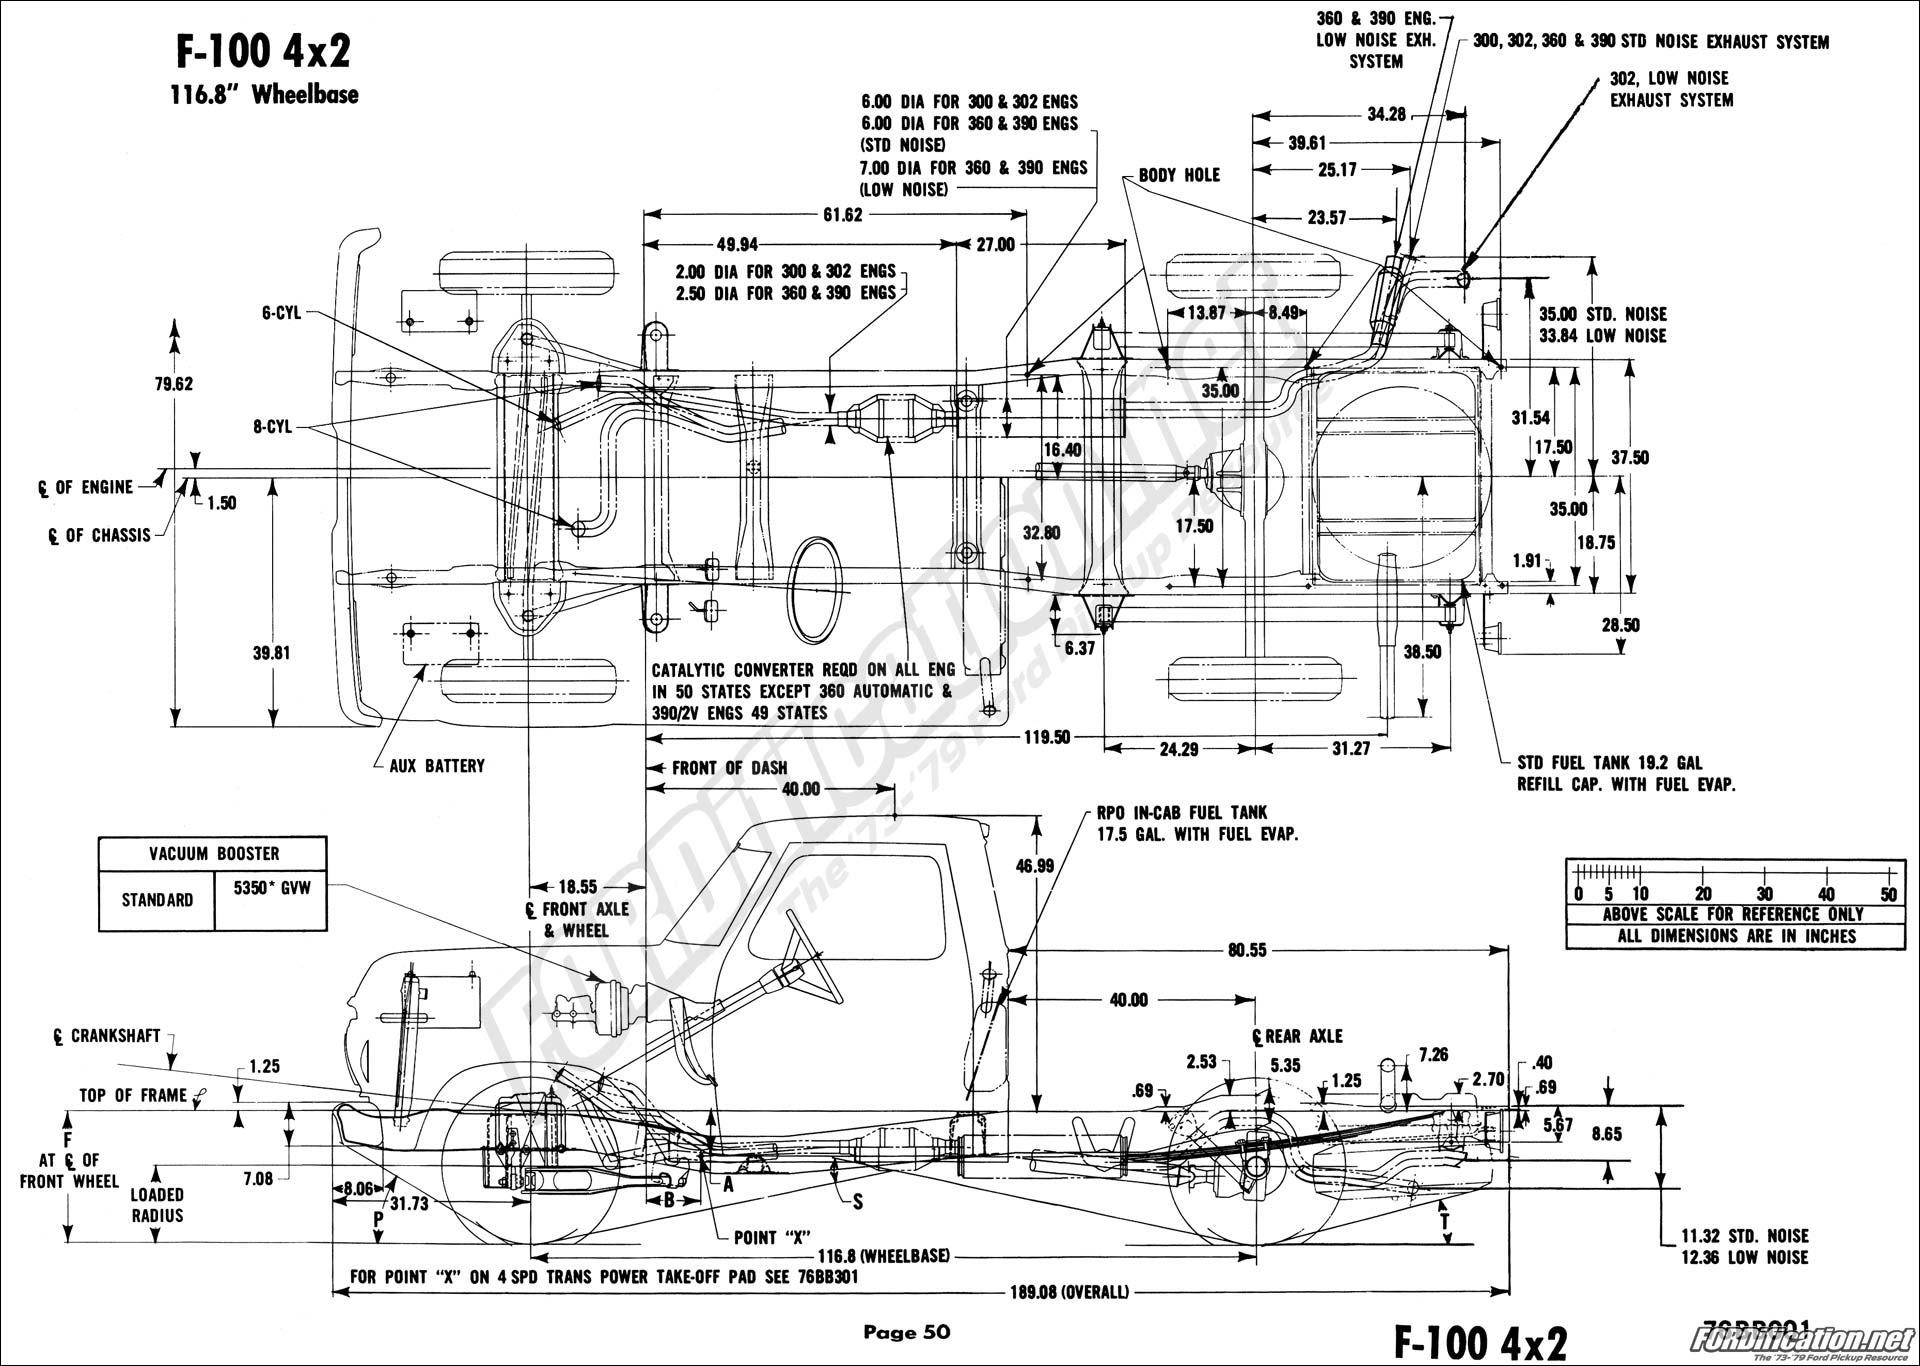 Ford F100 Frame Dimensions